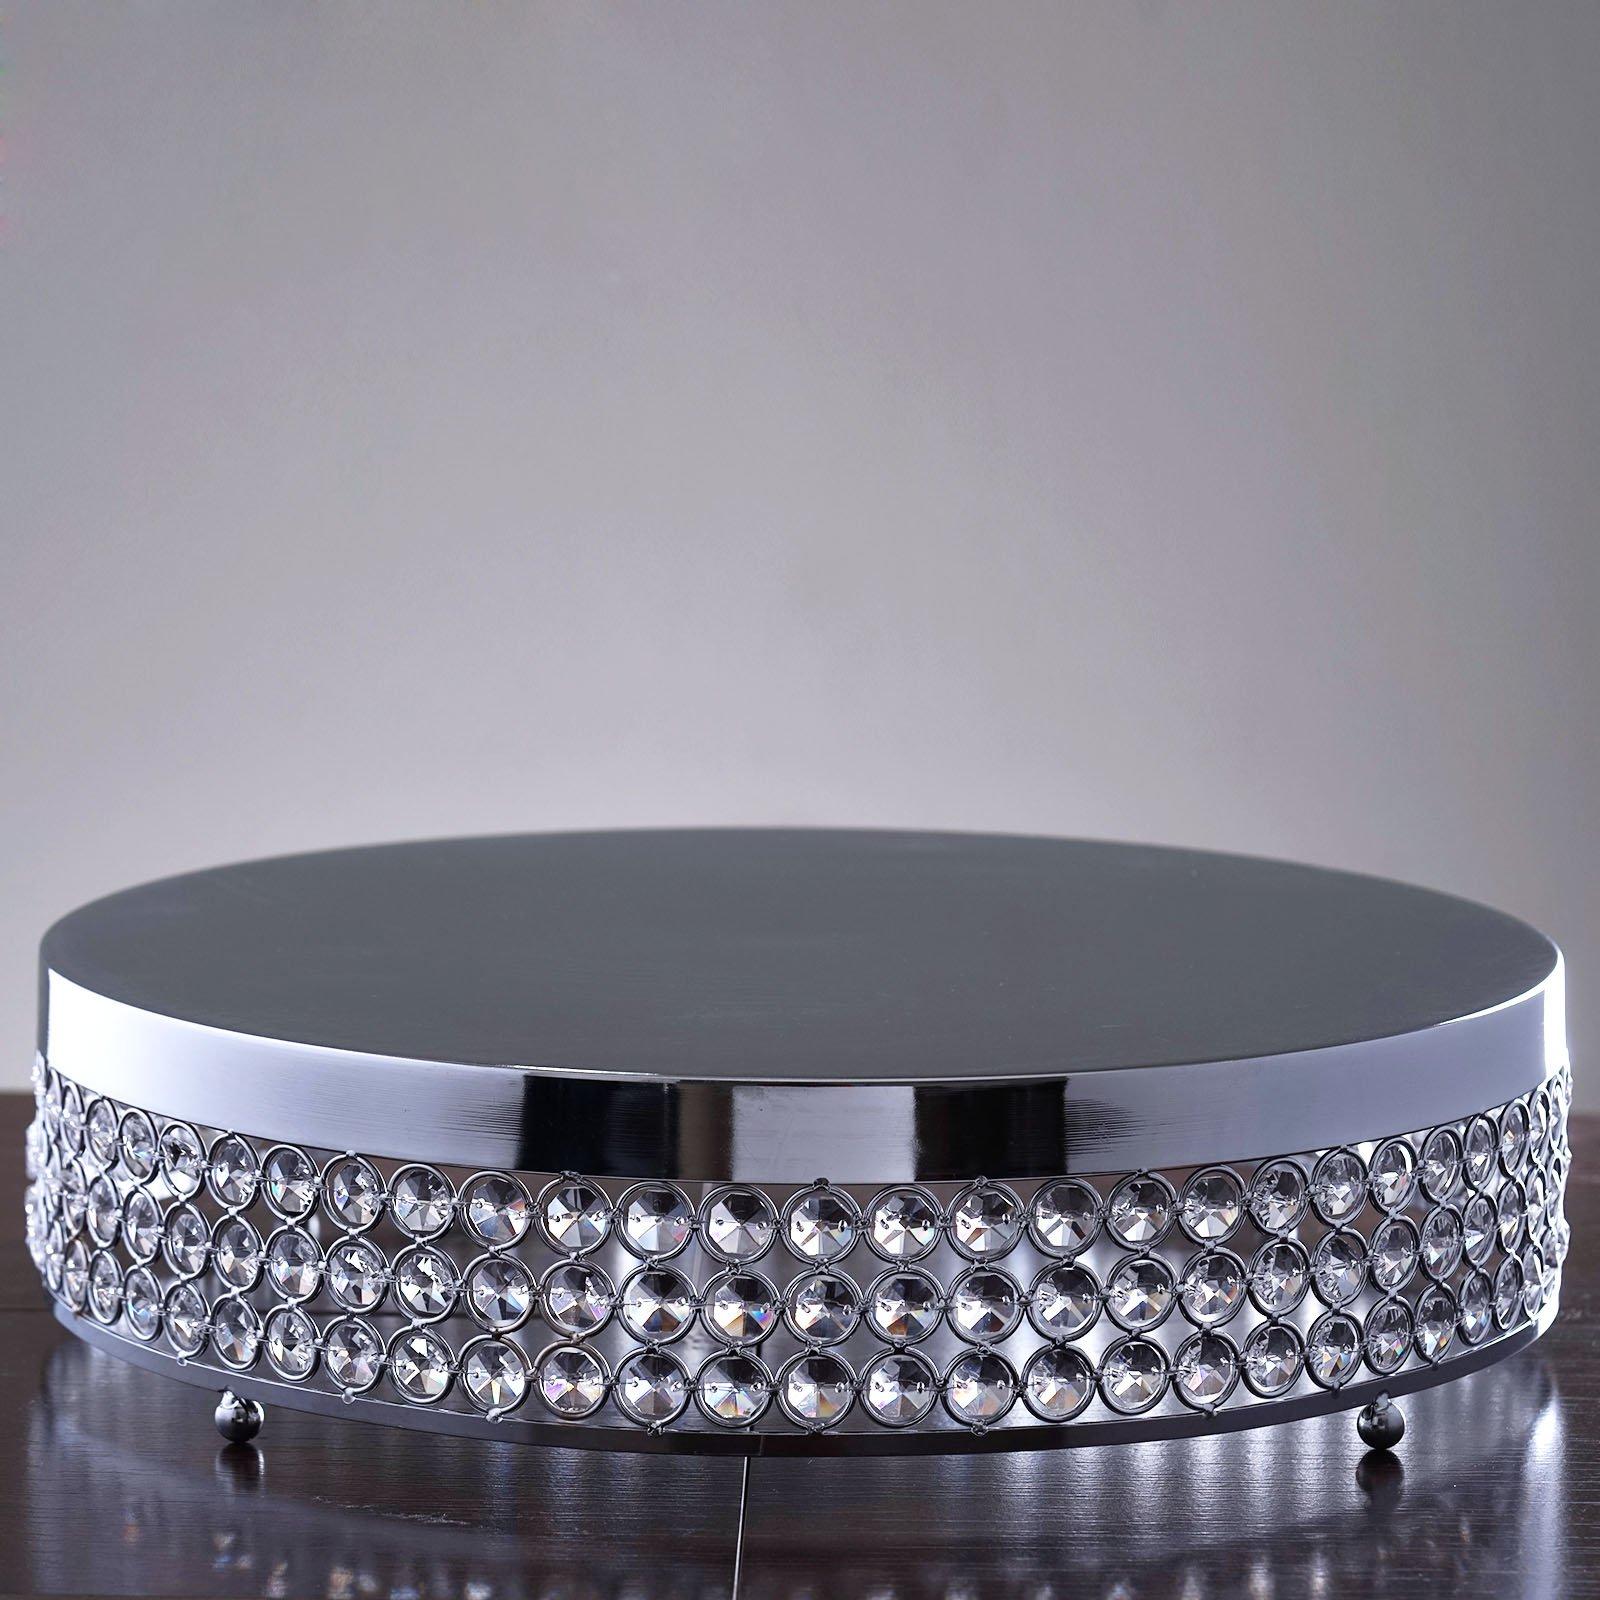 Tableclothsfactory Grand Wedding Beaded Crystal Metal Cake Stand - 15.5'' Diameter